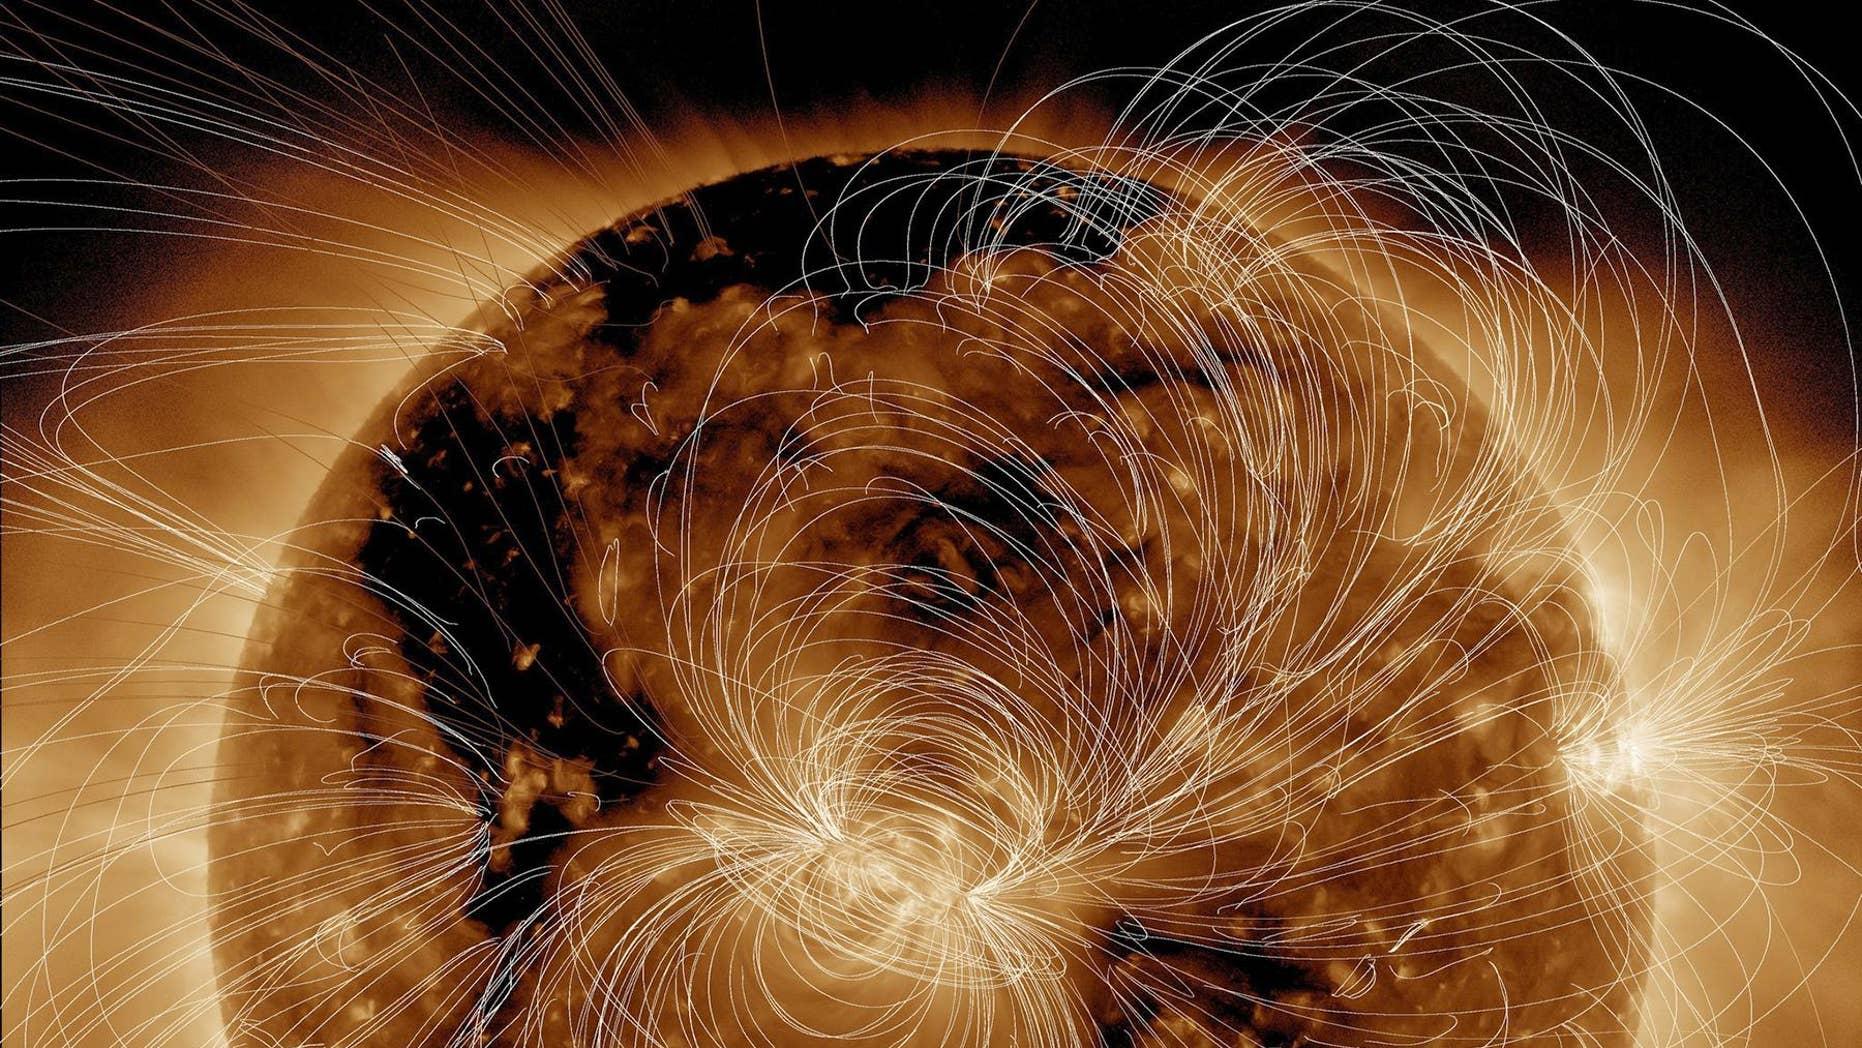 (Credit: NASA/GSFC/Solar Dynamics Observatory)